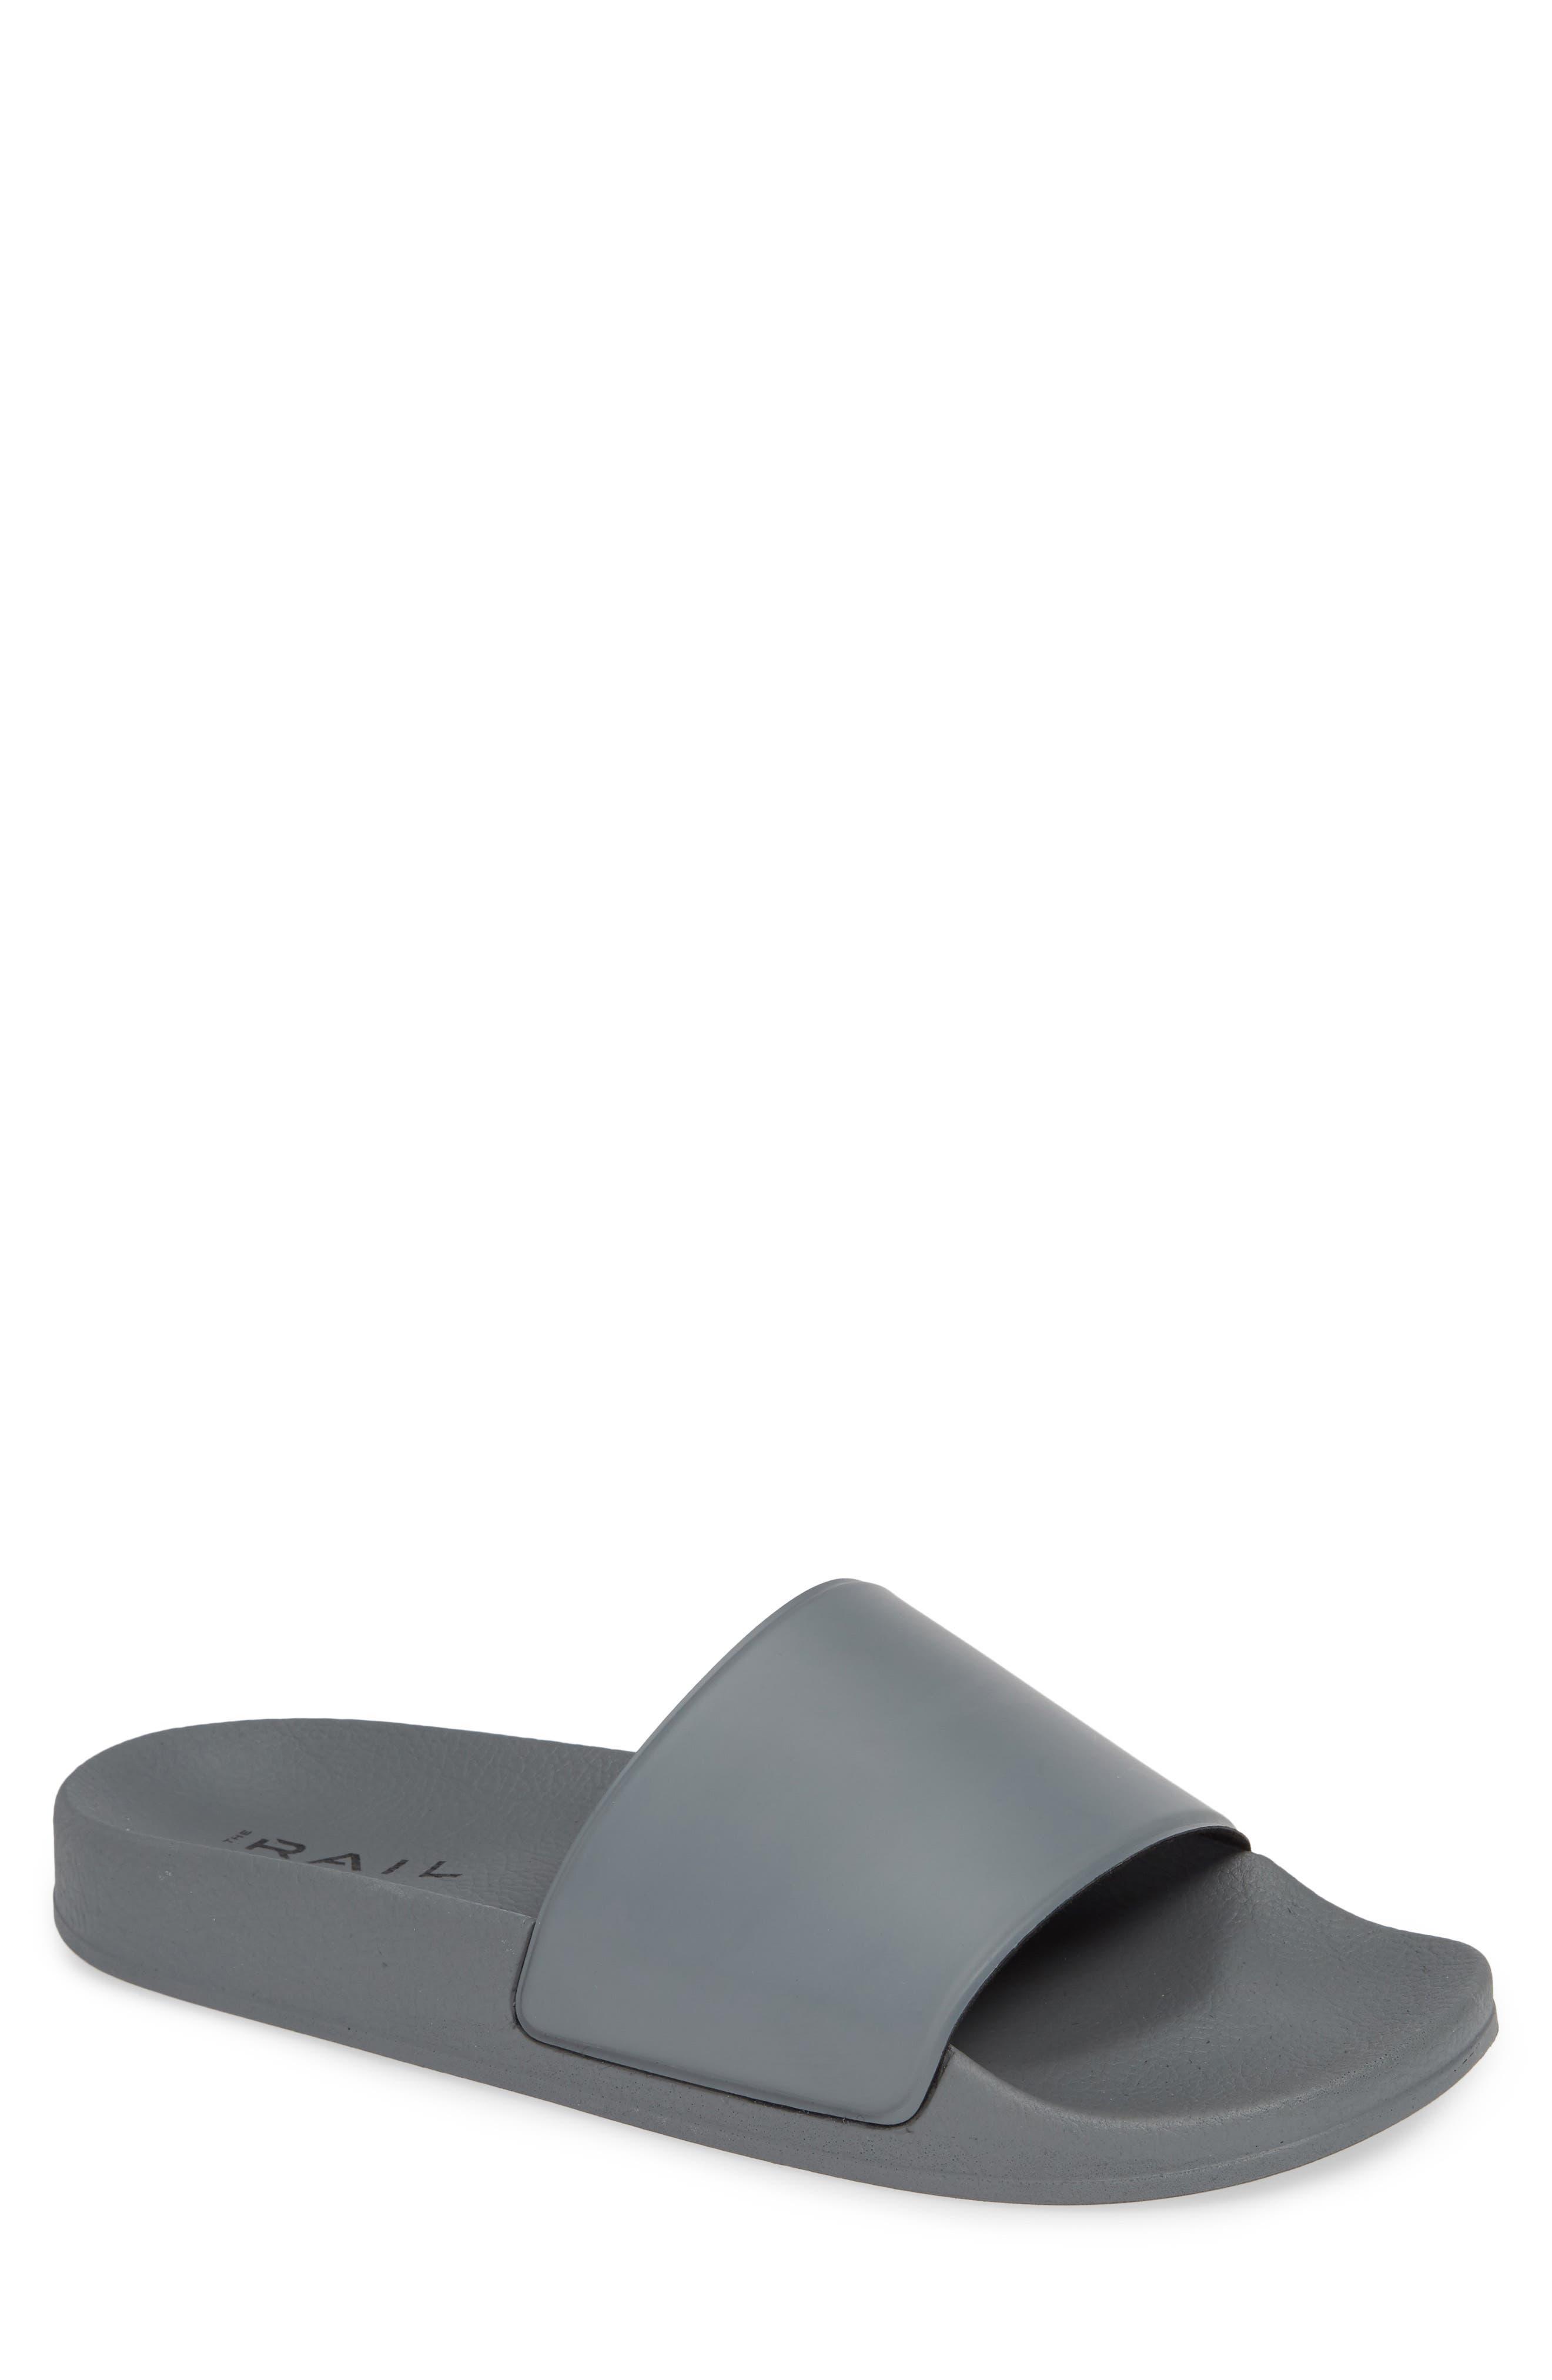 Bondi Slide Sandal,                         Main,                         color, GREY